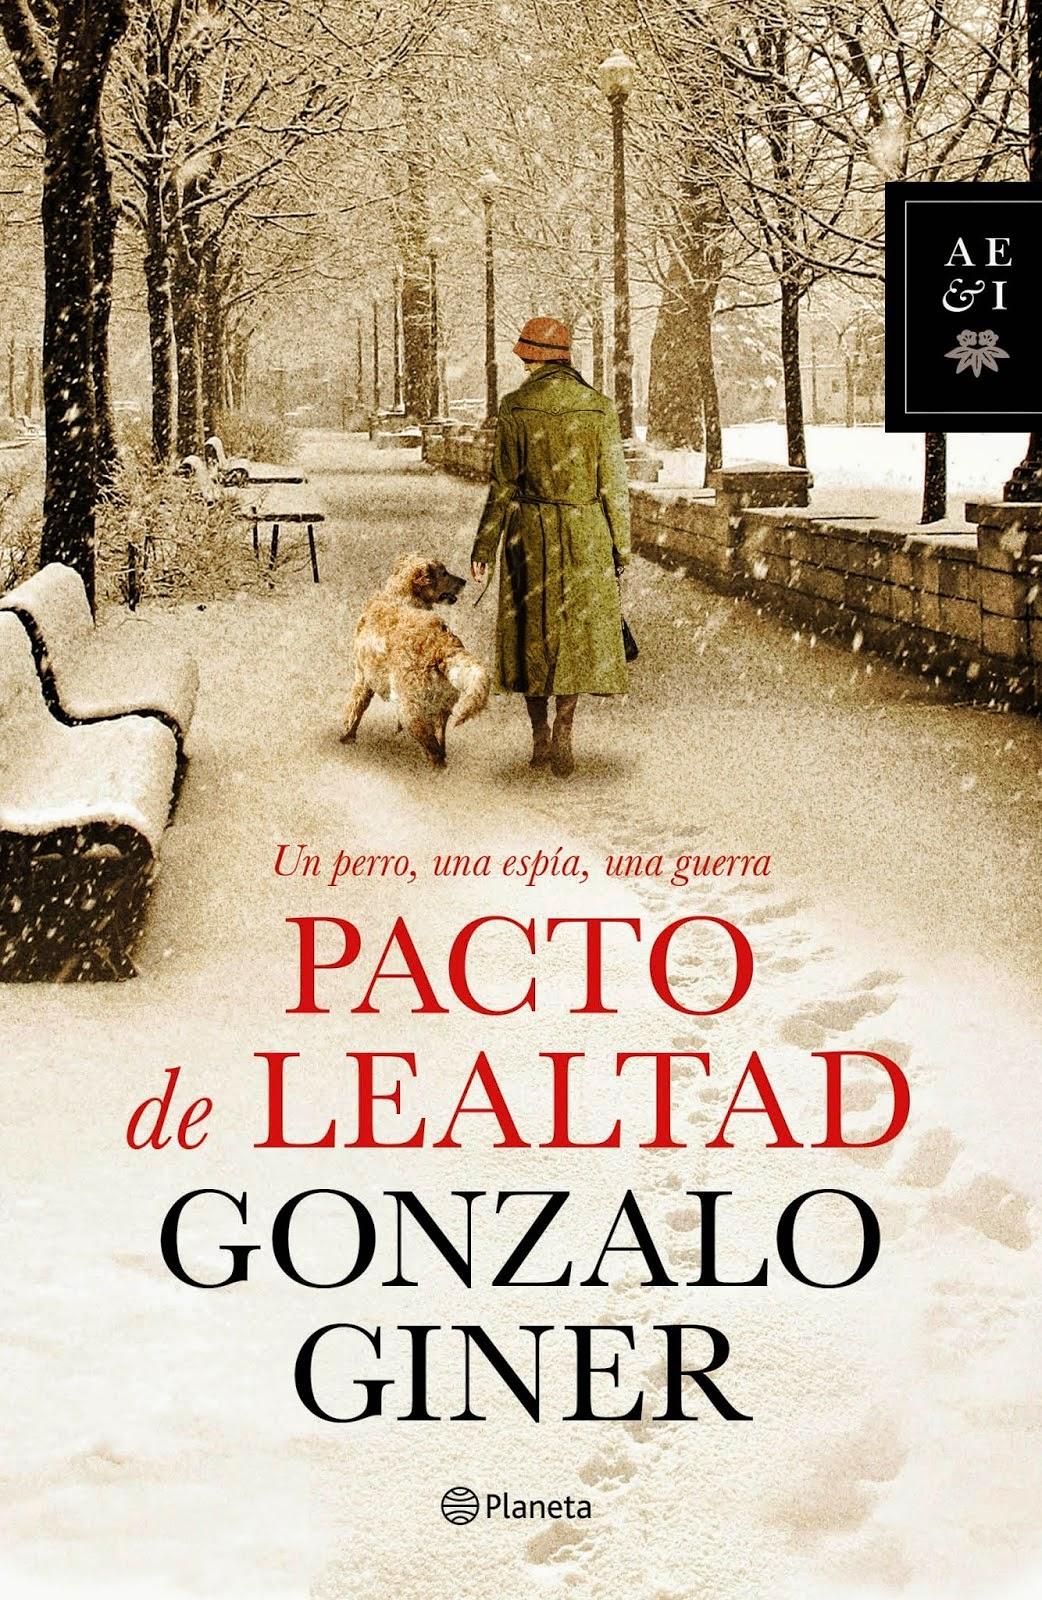 http://laorilladeloslibross.blogspot.com.es/2014/06/pacto-de-lealtad-gonzalo-giner.html